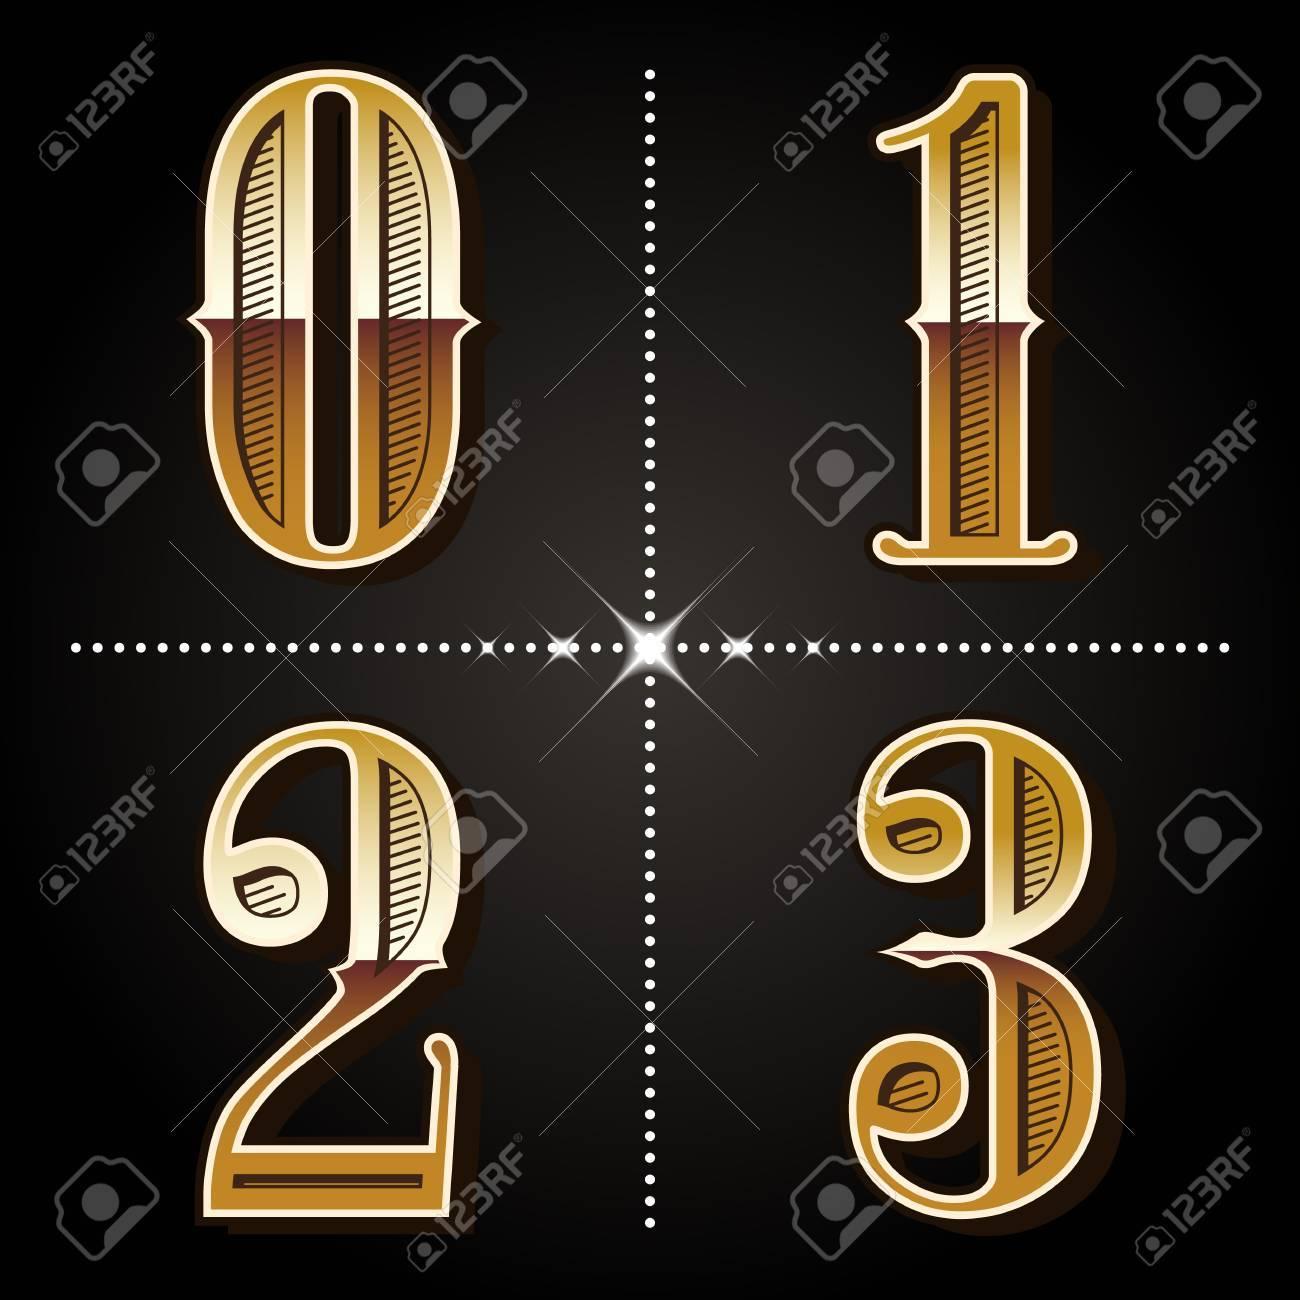 Millesimes en 6 lettres